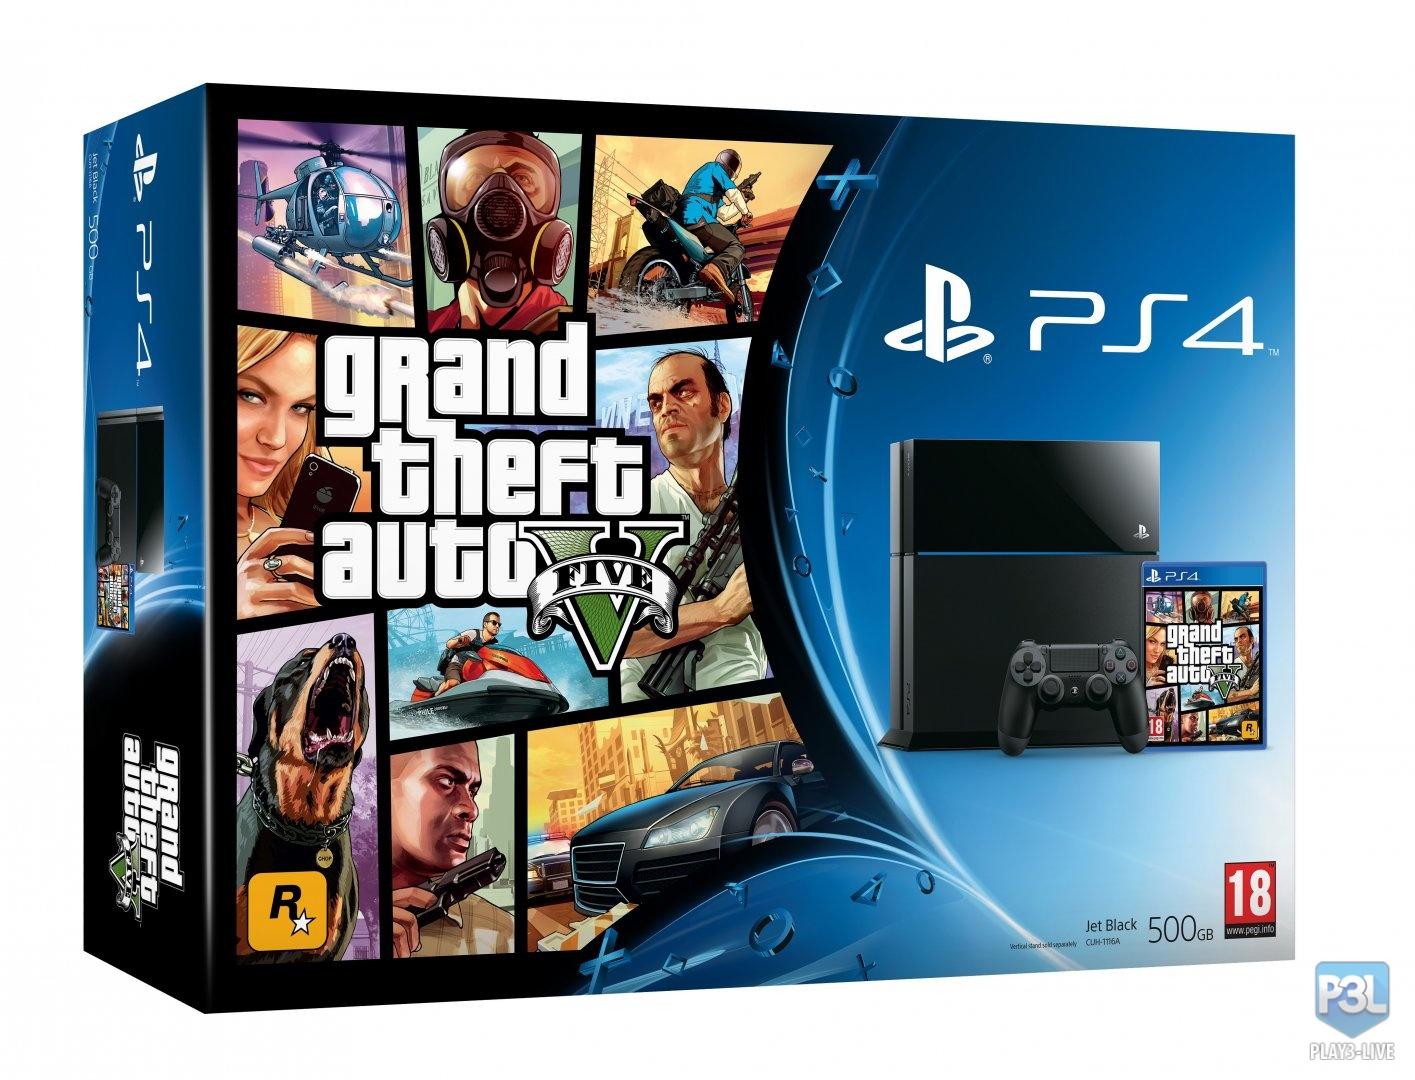 GTA 5 bude i v edici s bílou PS4 101416